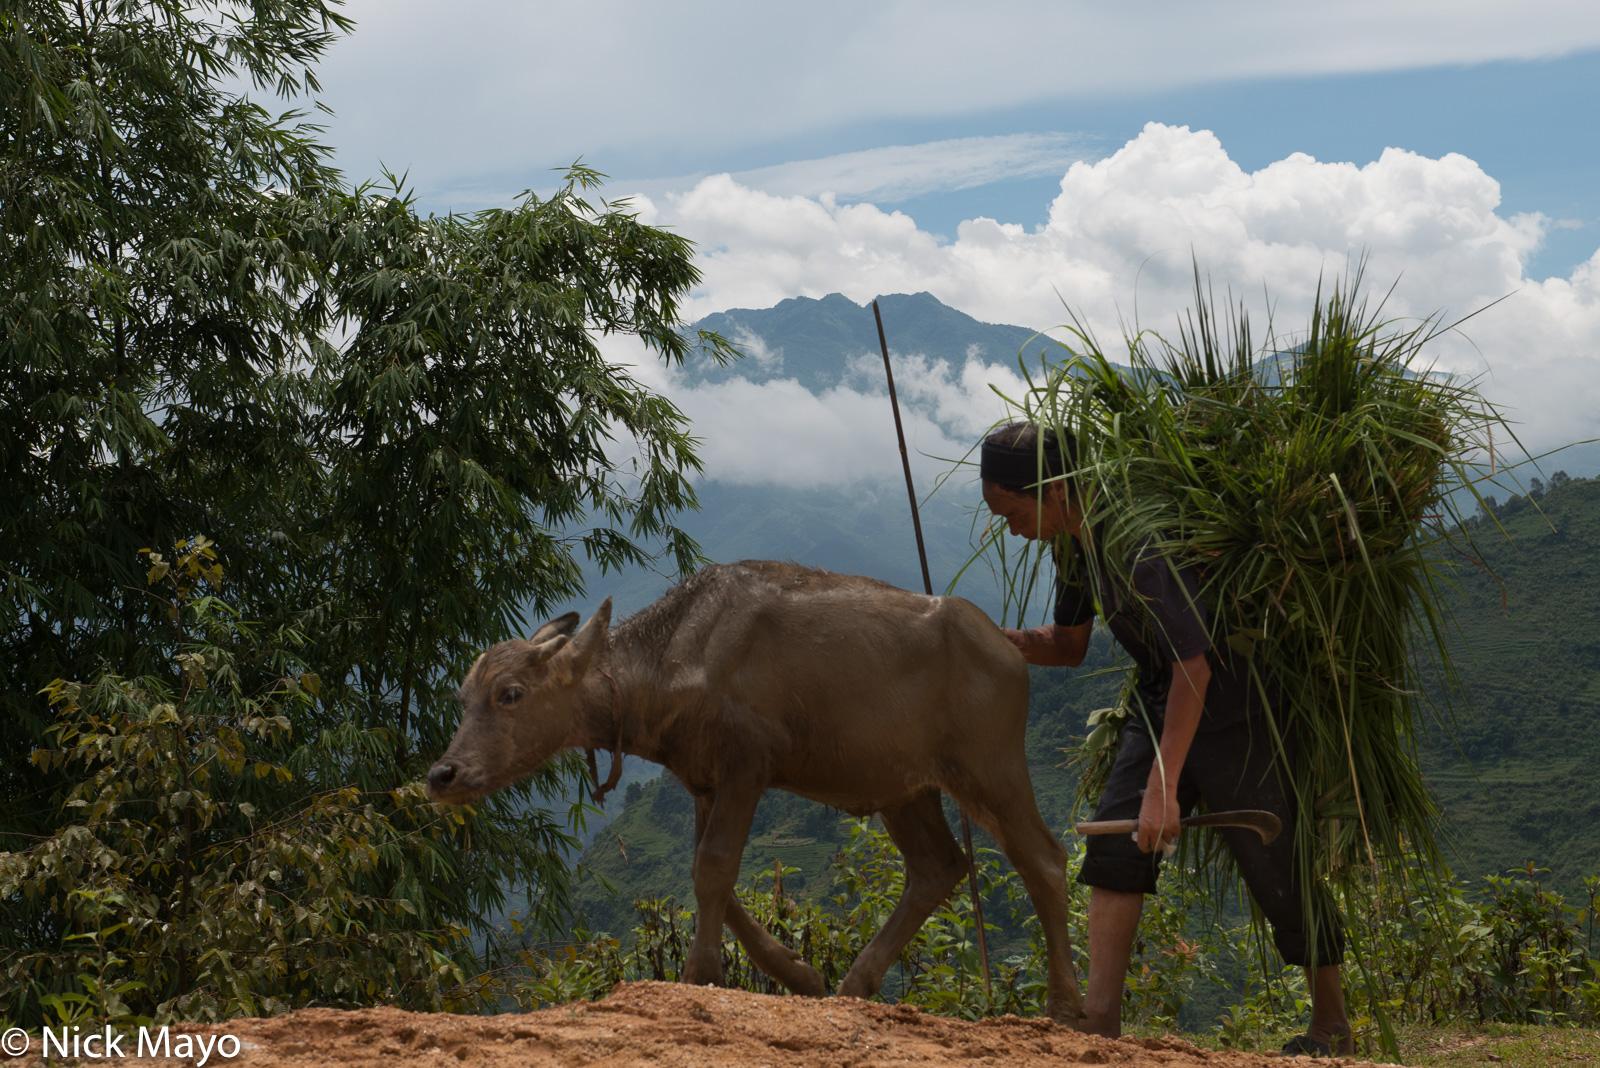 A La Chi farmer with a load of fodder driving a young water buffalo home at Ban Phung.